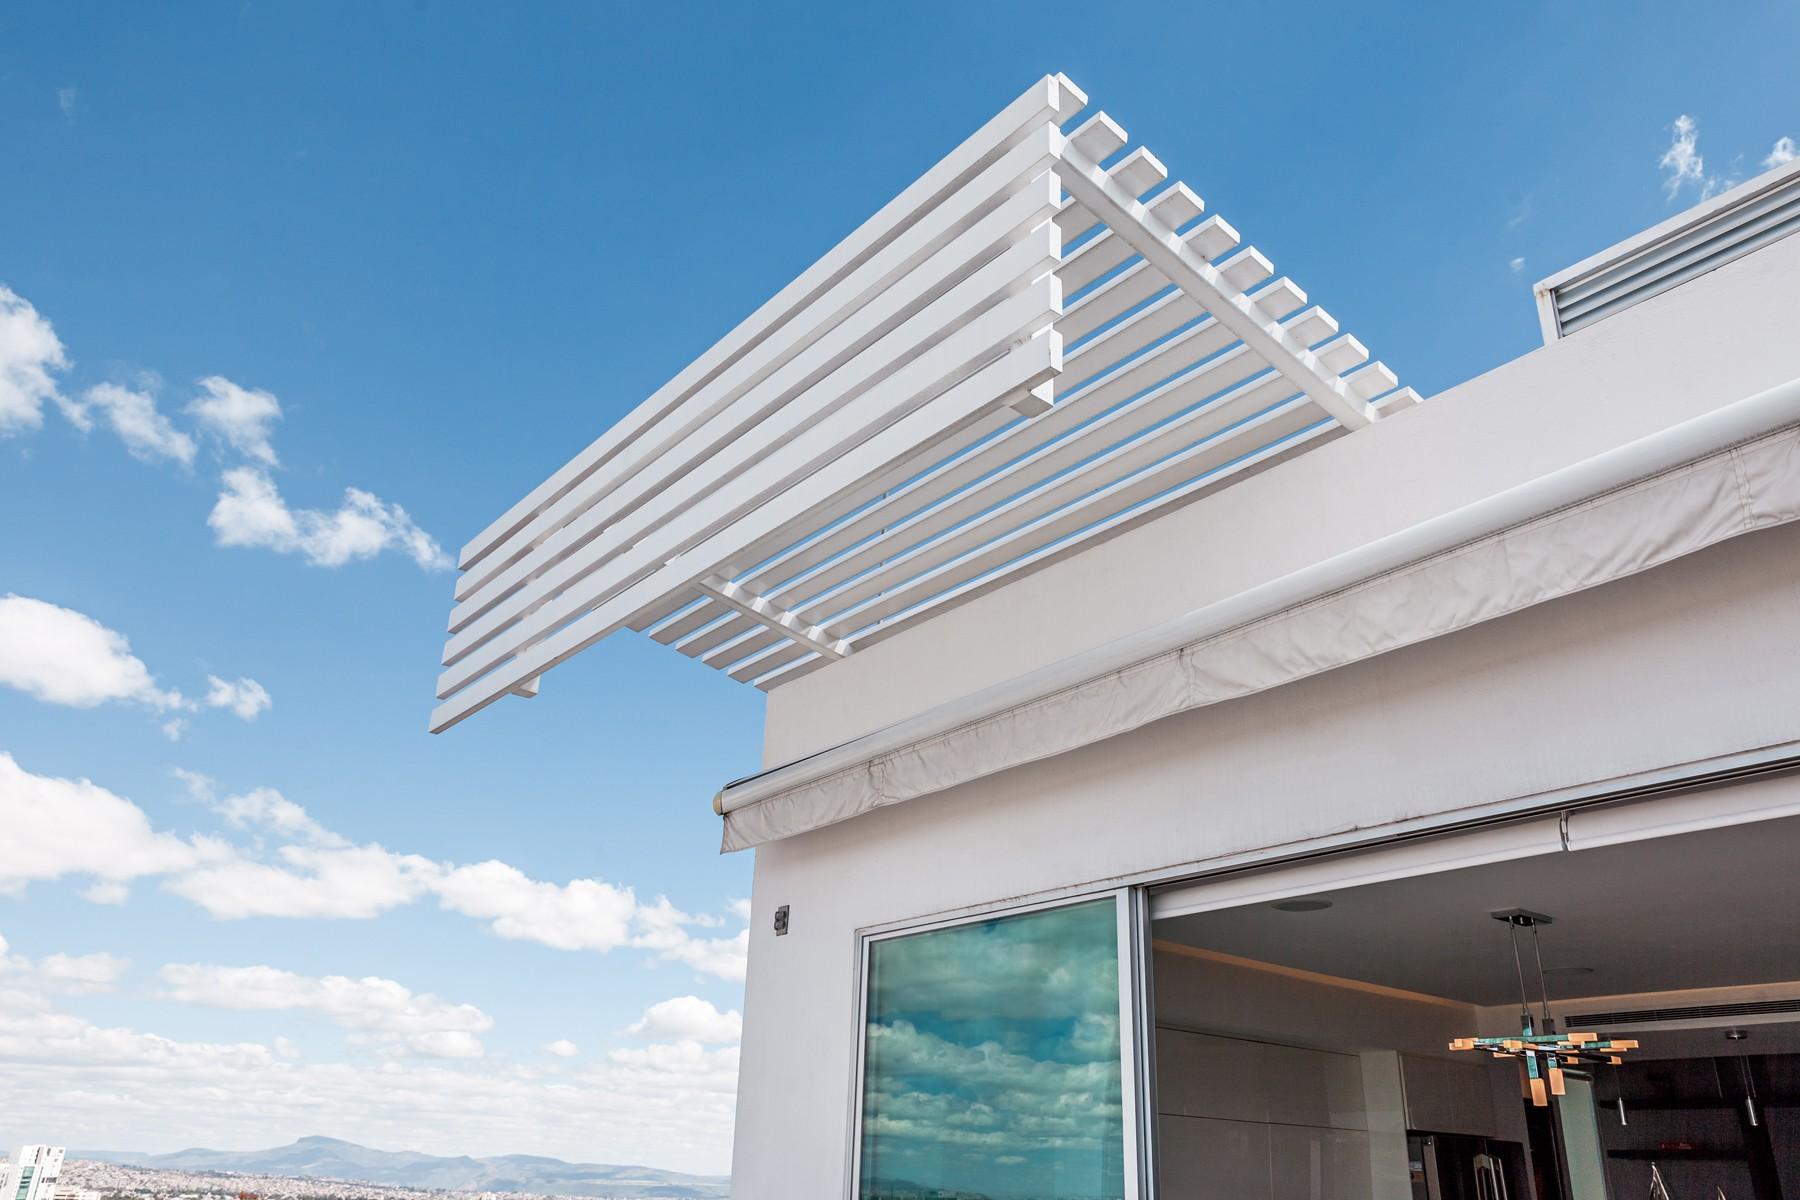 Additional photo for property listing at Penthouse de Lujo Jose Maria Vigil 1716 Guadalajara, Jalisco 44620 México